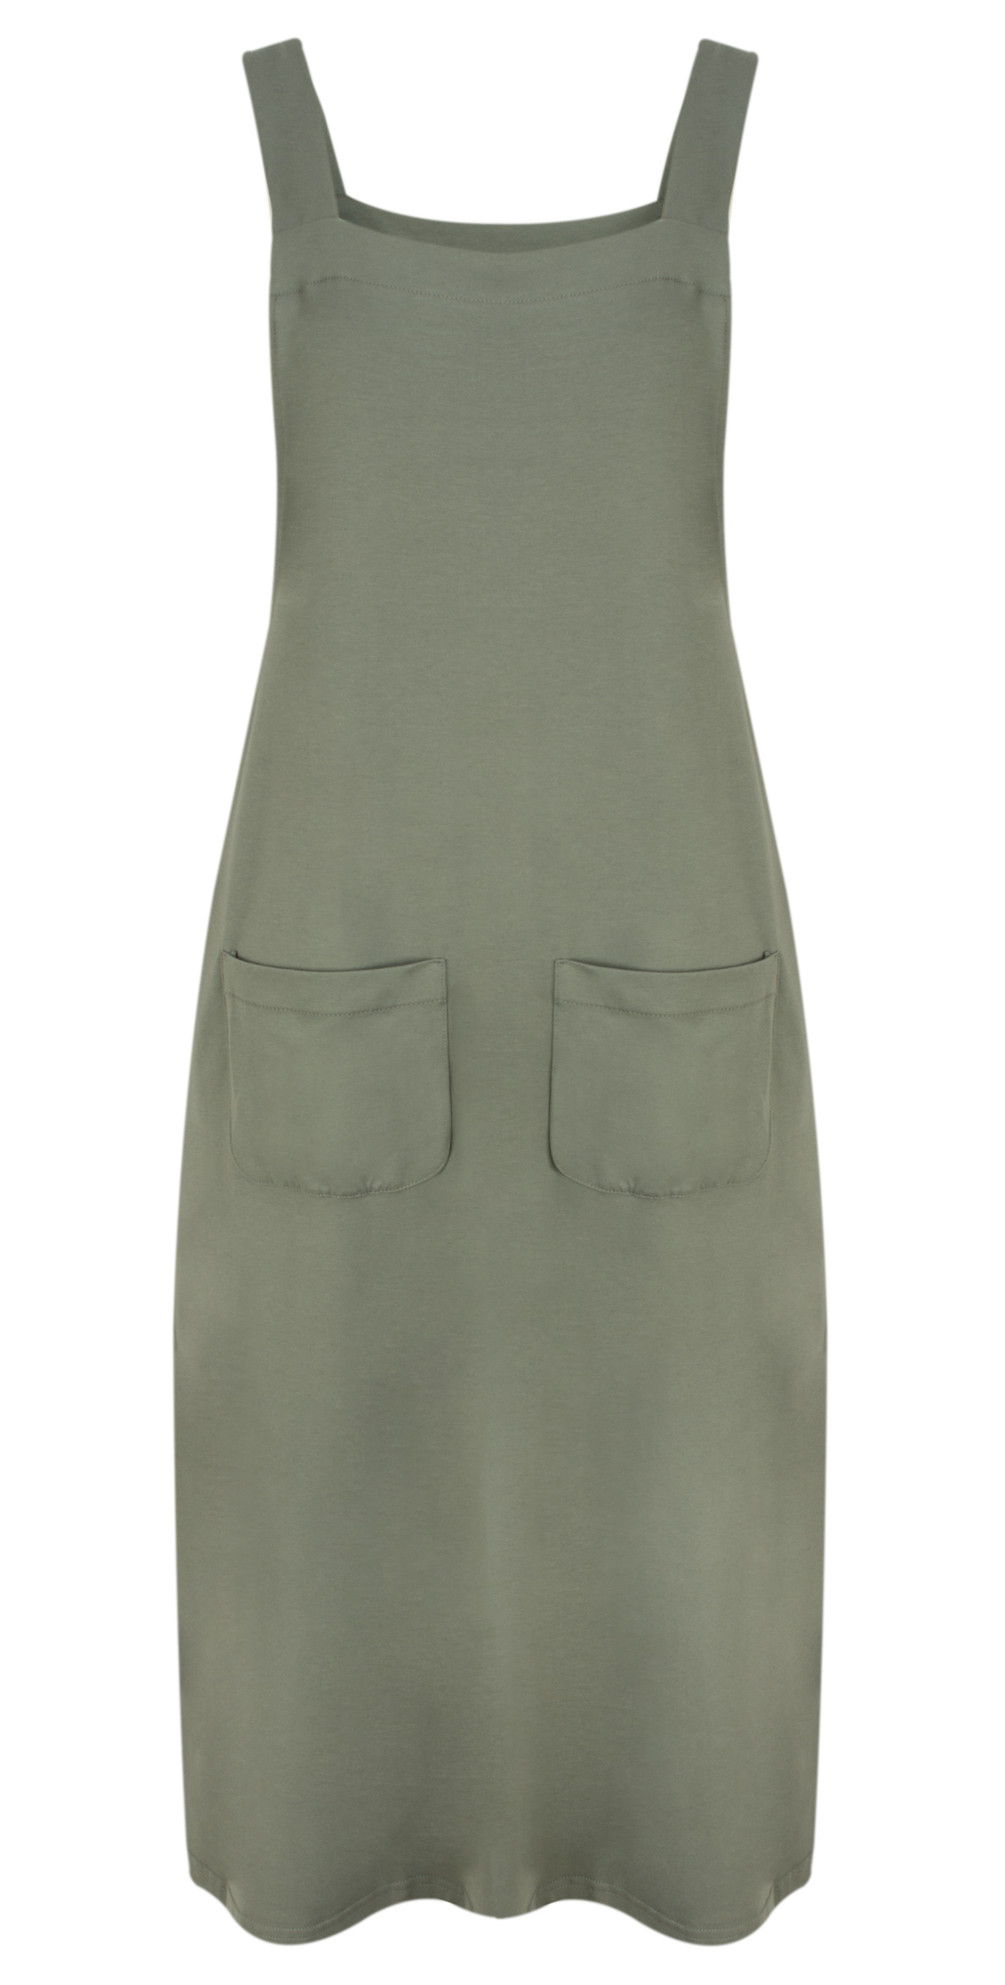 Matisse Pinafore Dress main image